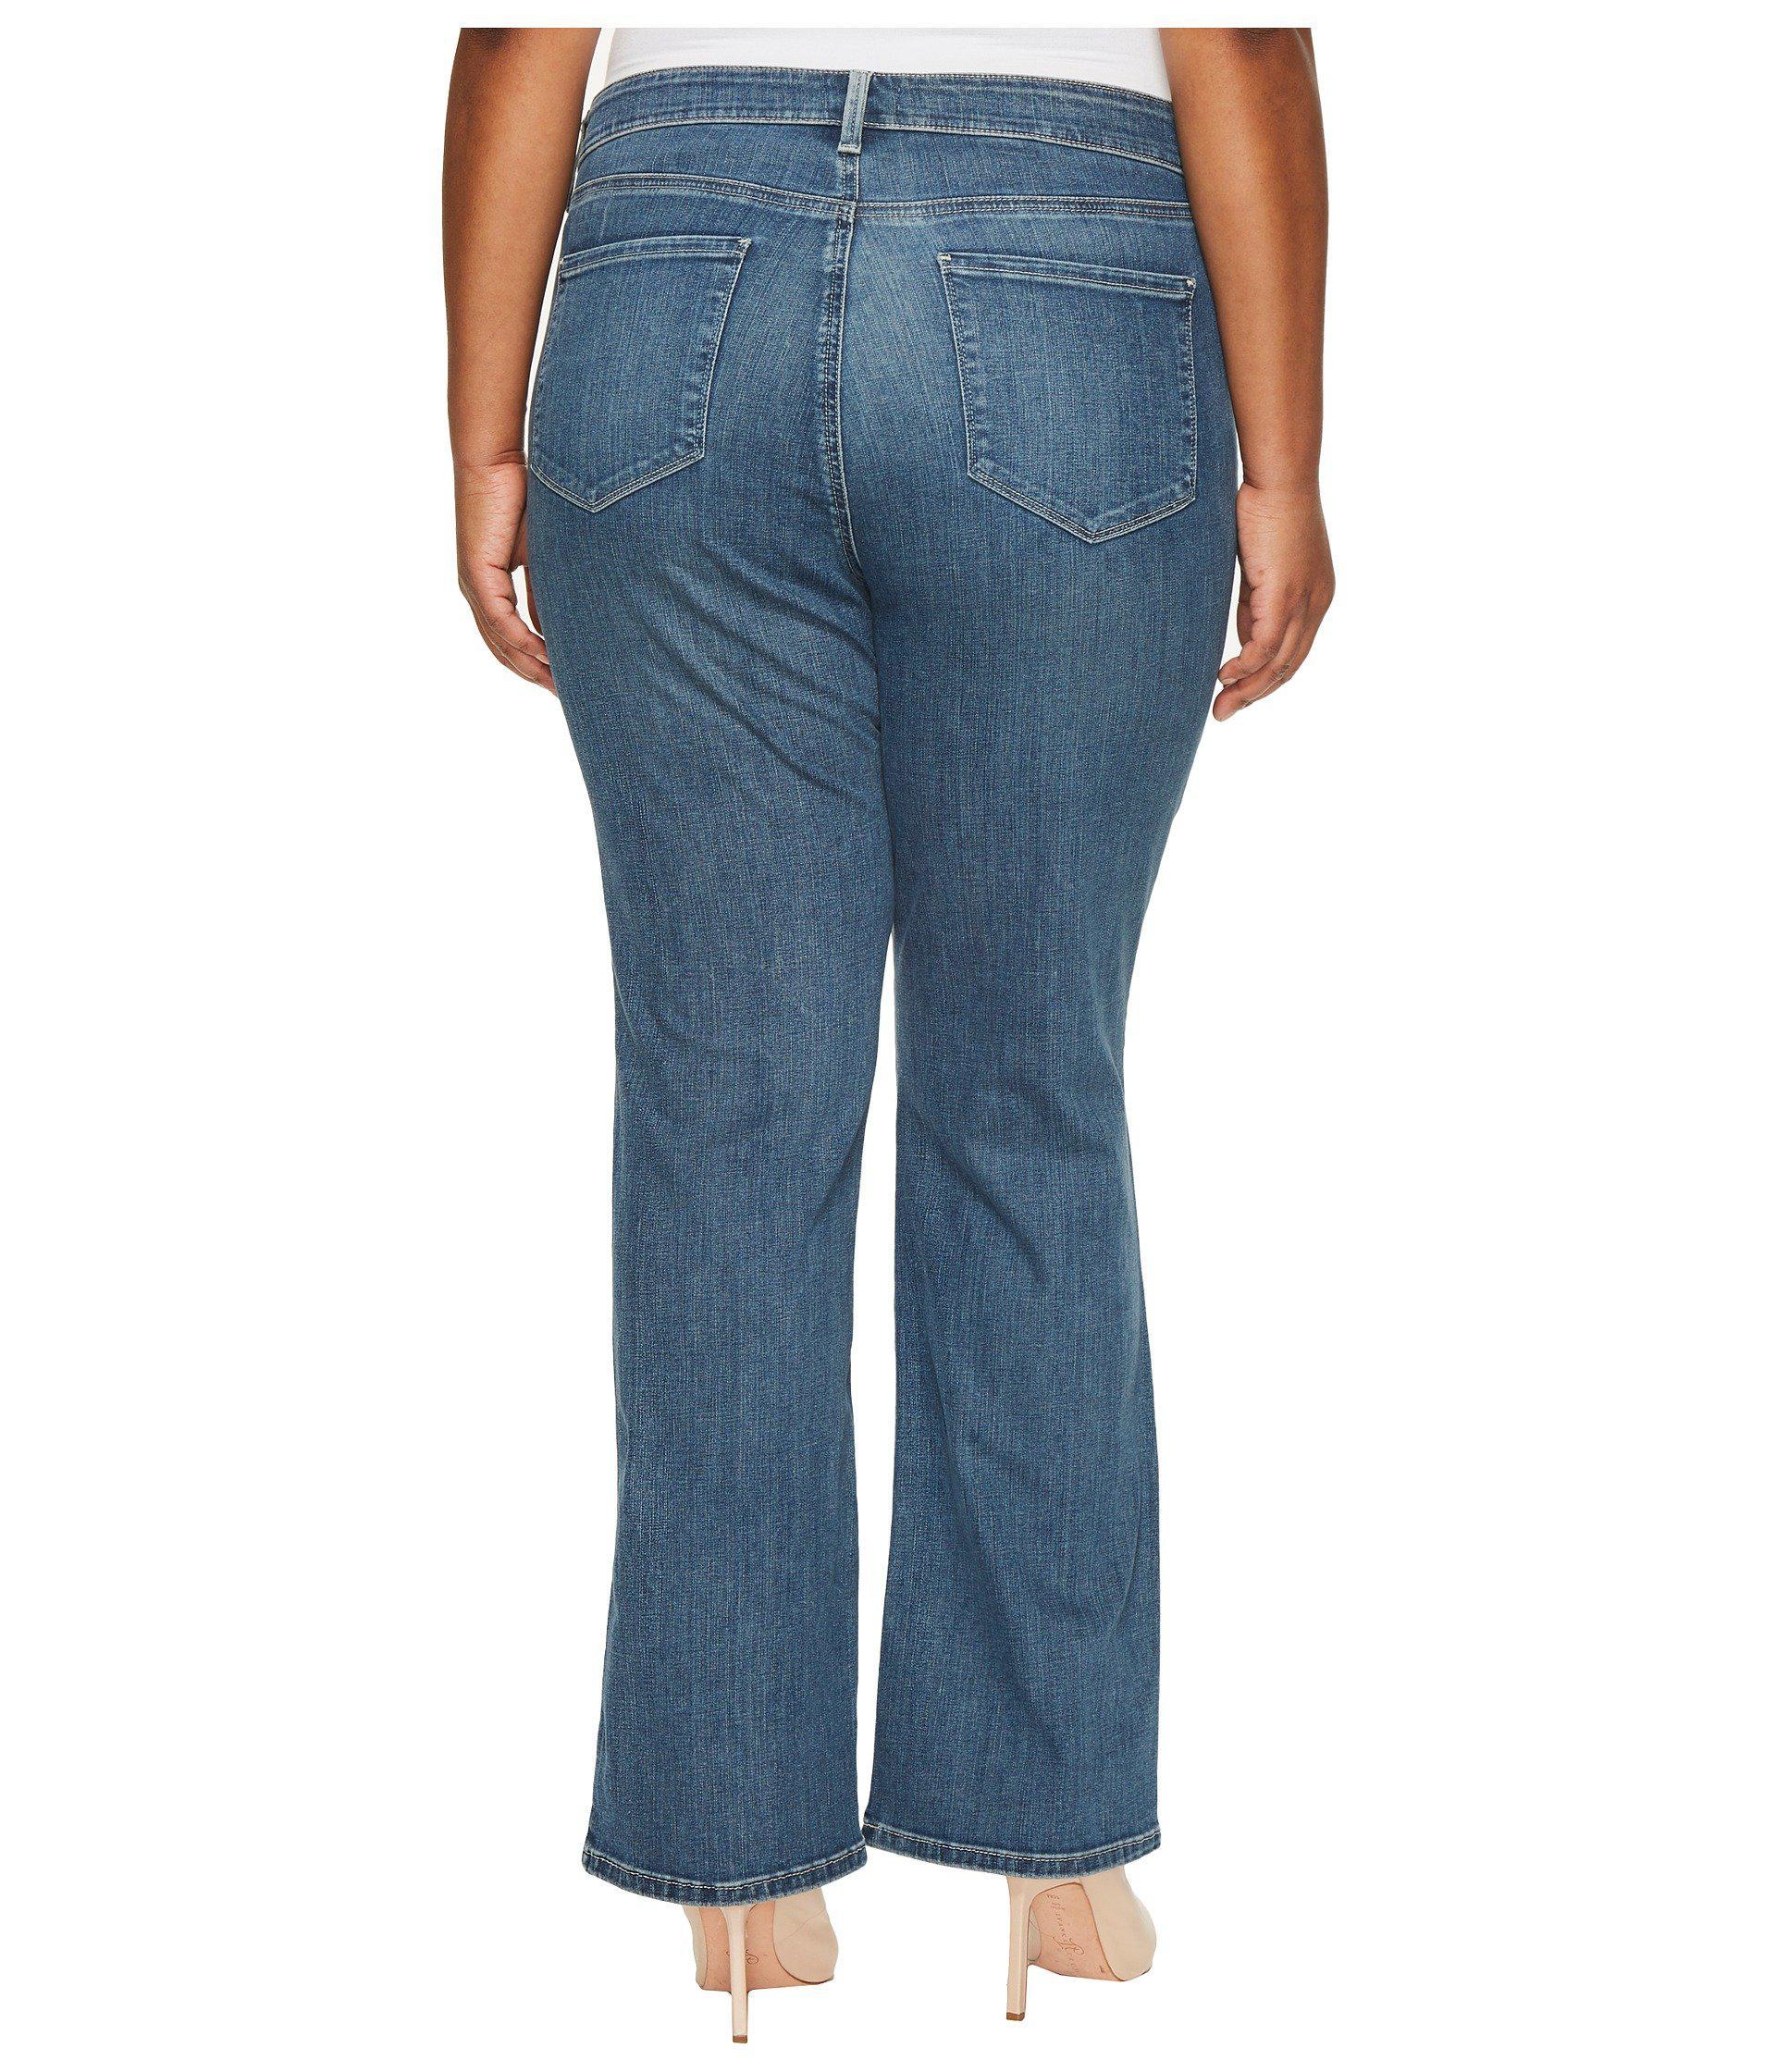 83bf464541 Lyst - NYDJ Plus Size Barbara Bootcut Jeans In Heyburn Wash in Blue